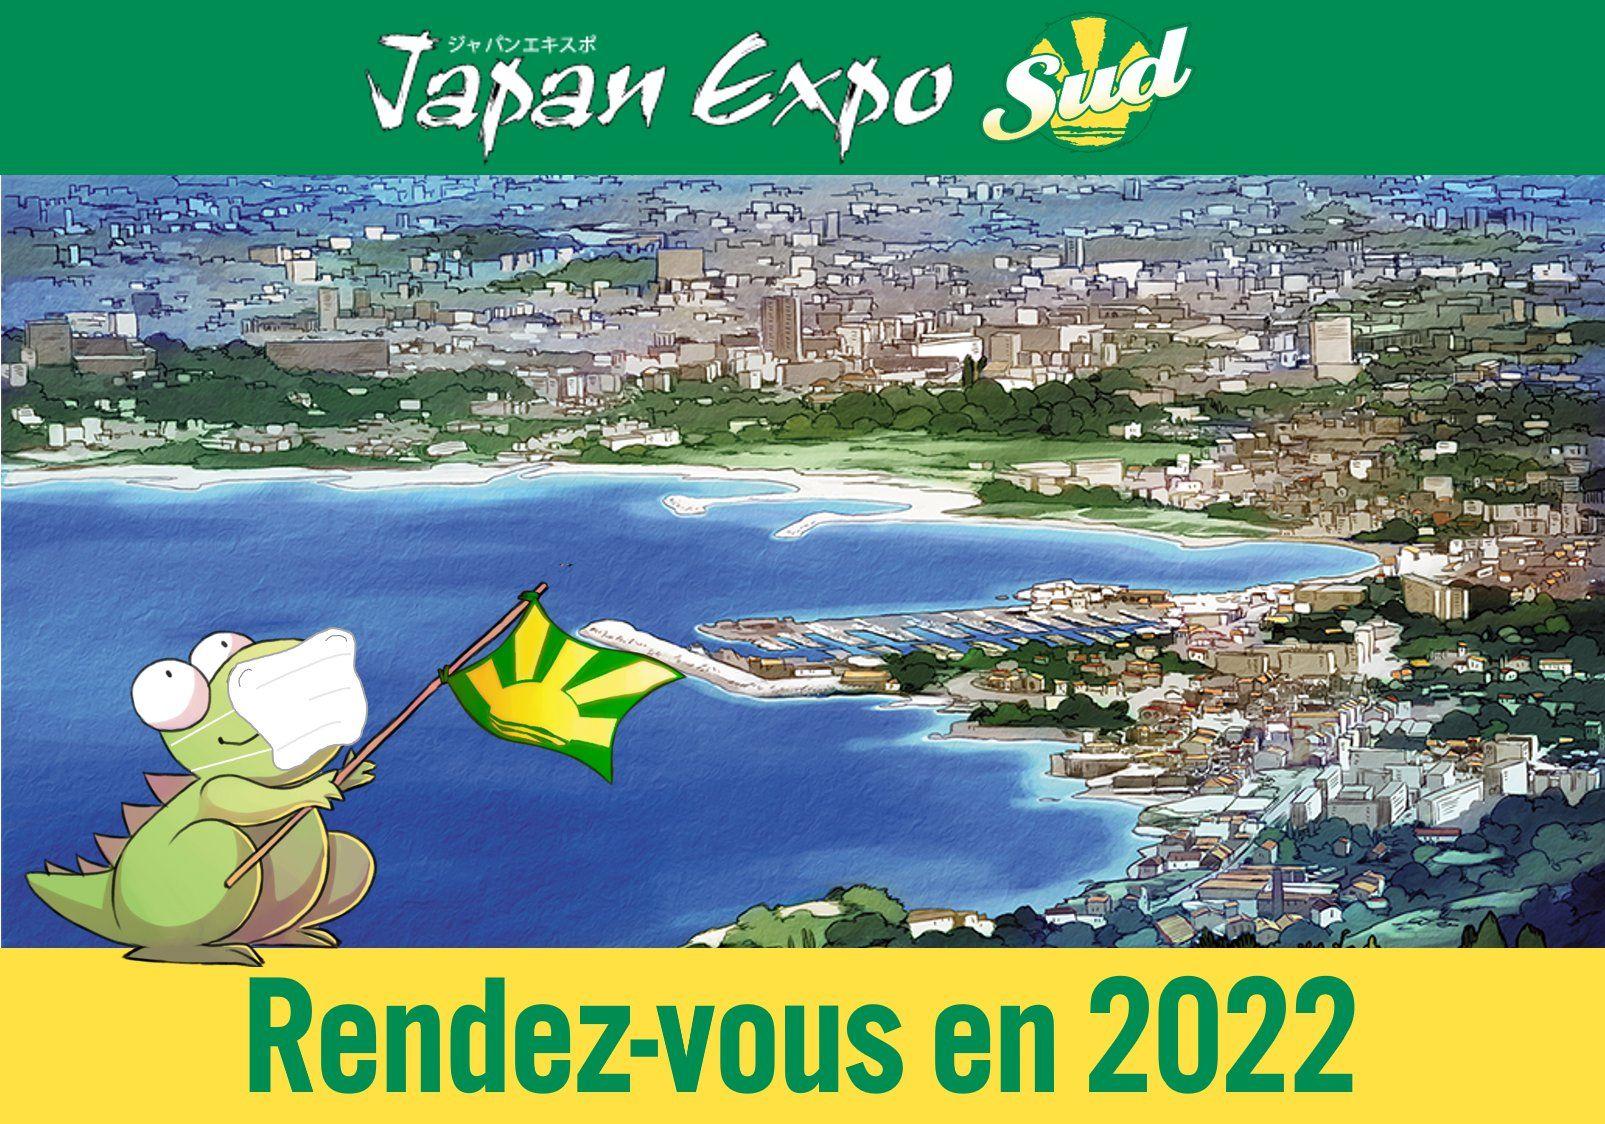 Japan_Expo_Sud-report.jpg